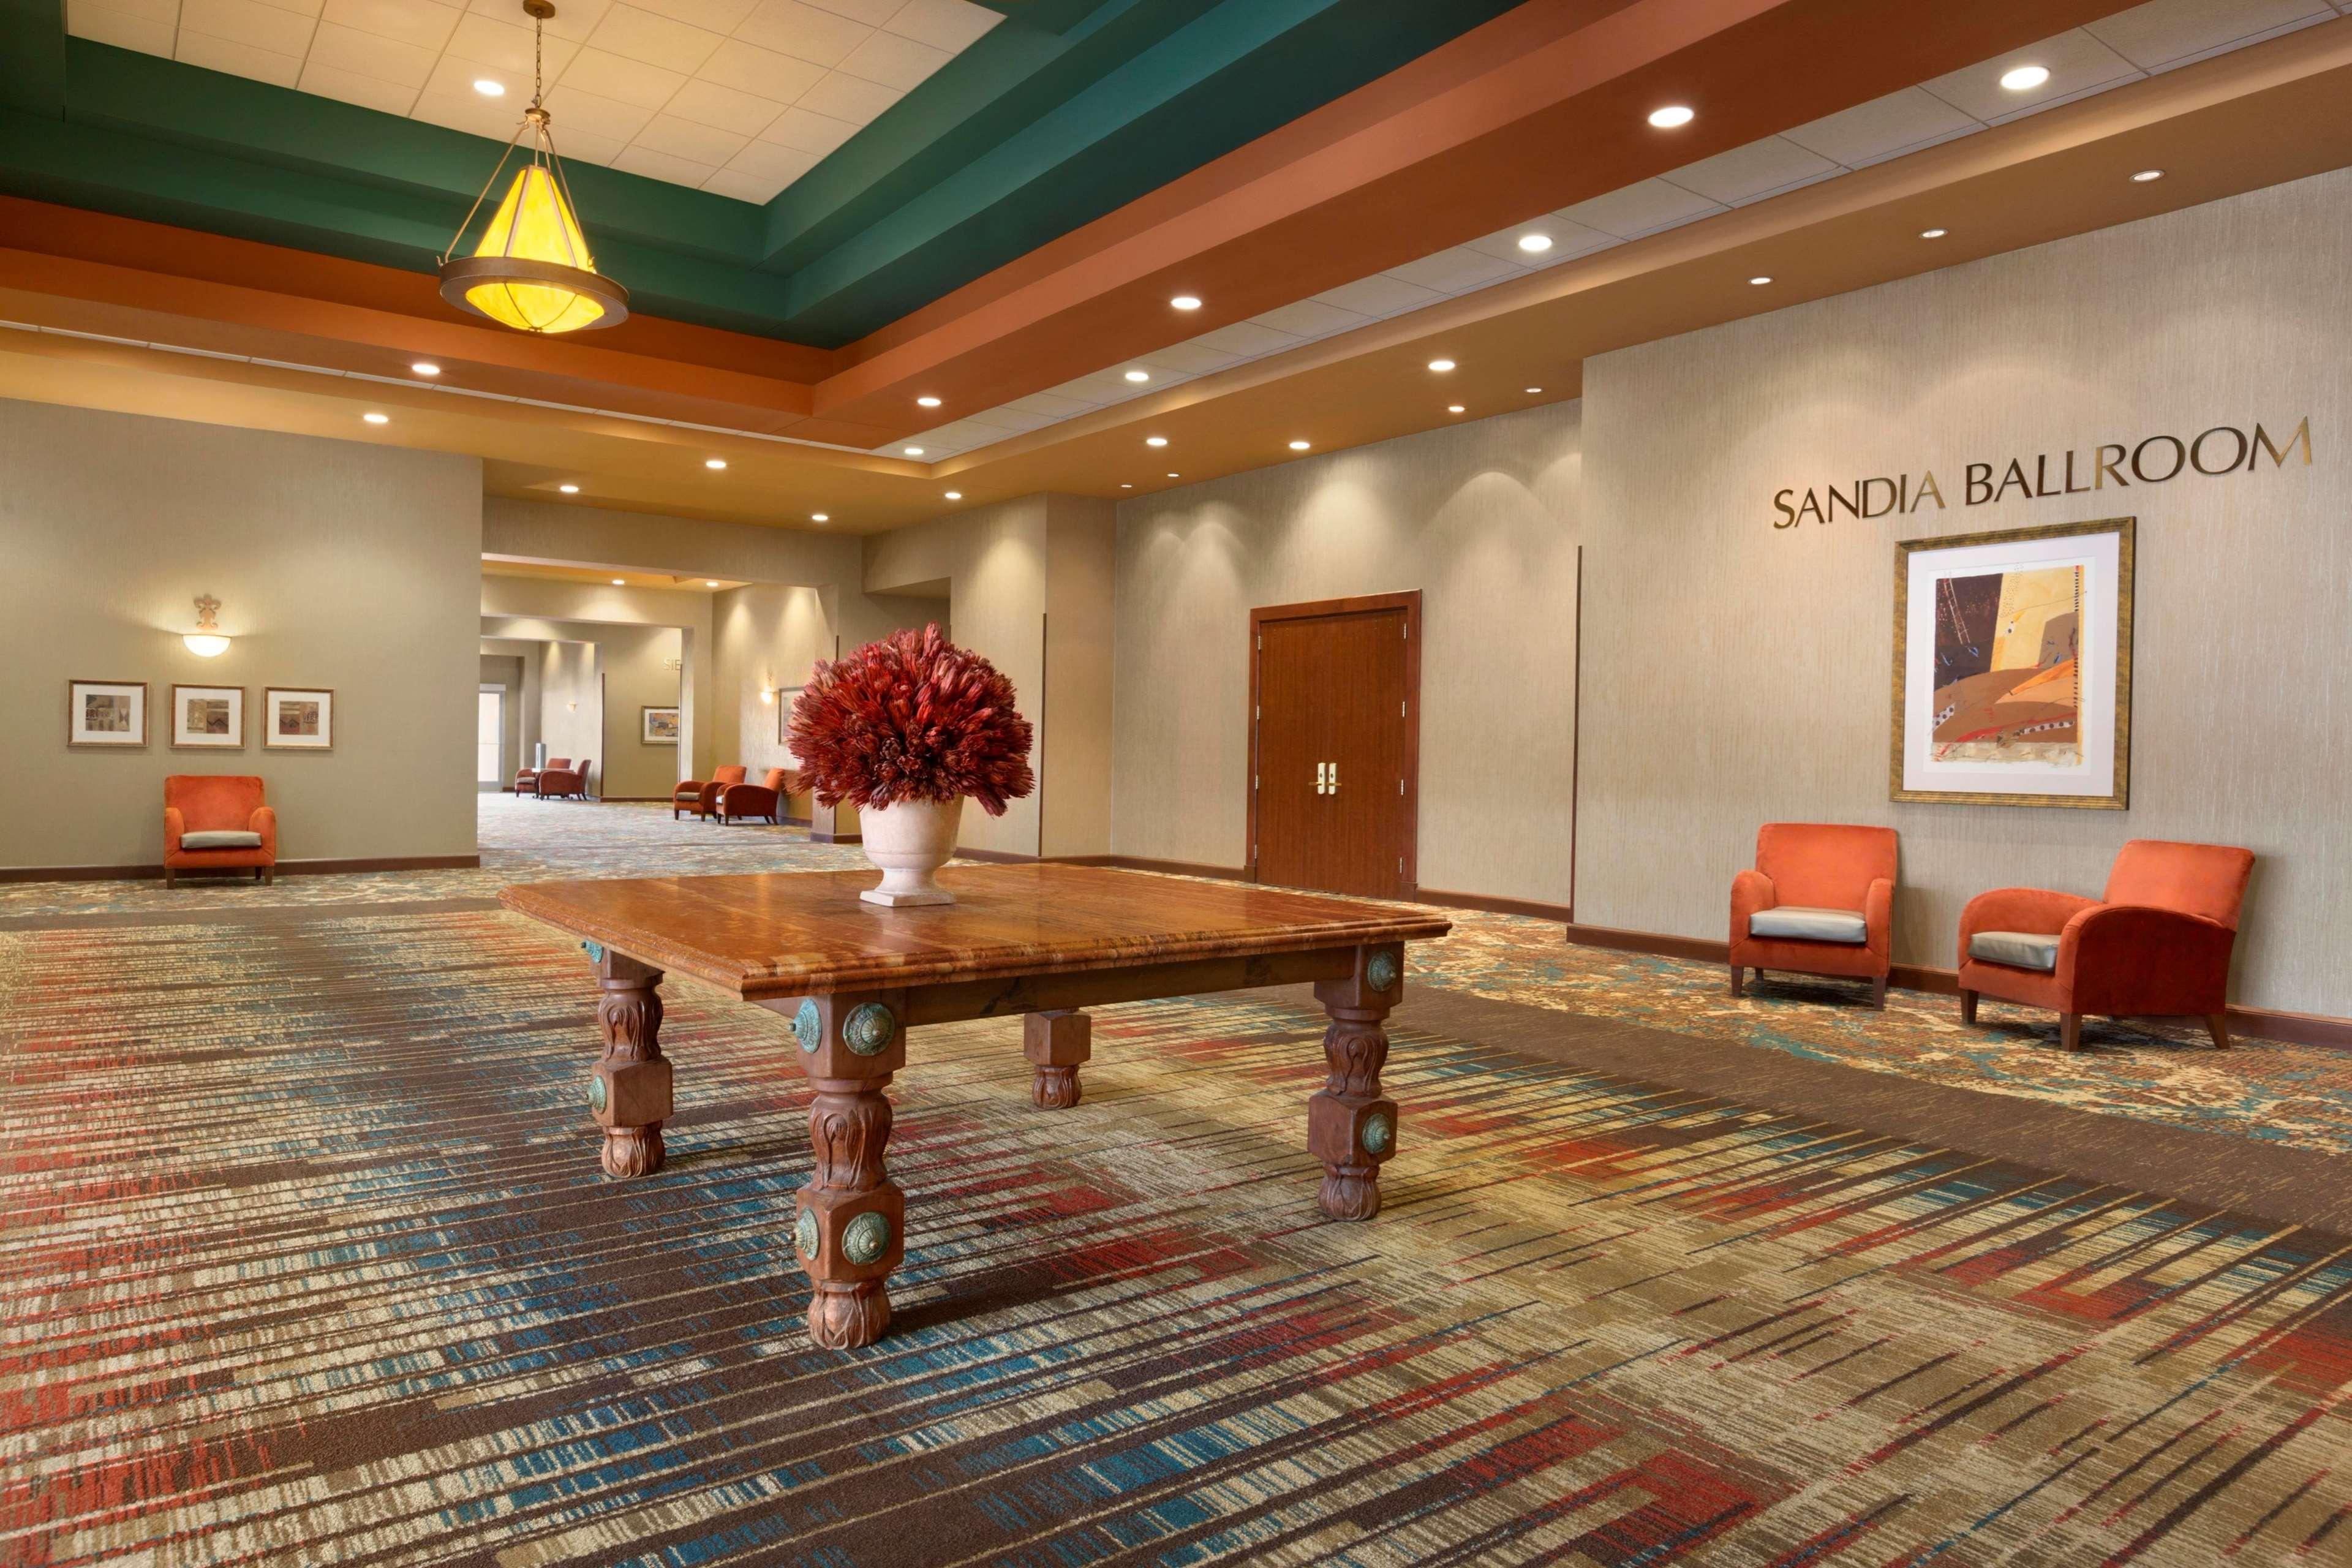 Embassy Suites by Hilton Albuquerque Hotel & Spa image 41